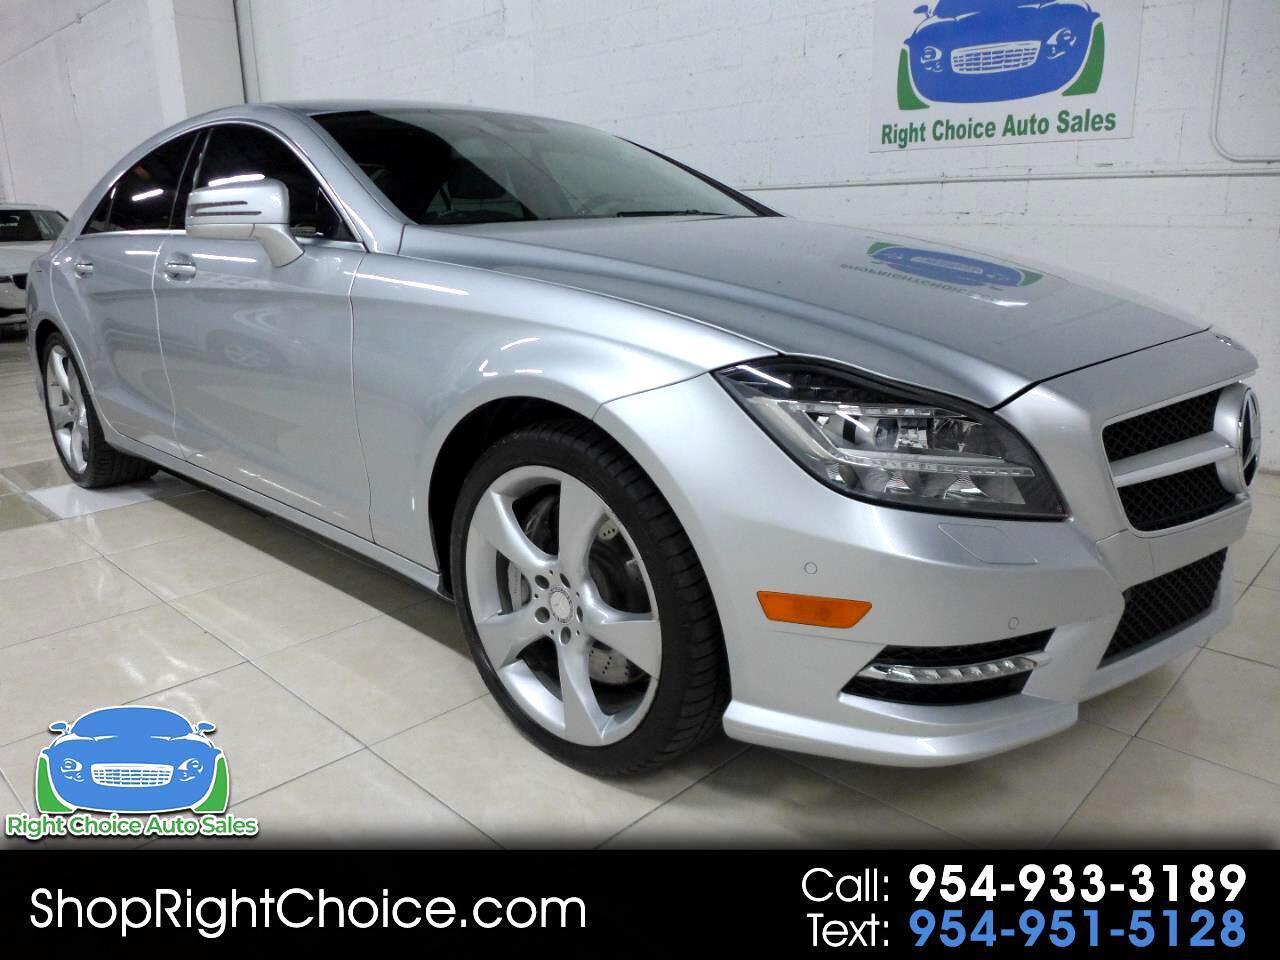 Used Cars for Sale Pompano Beach FL 33060 Right Choice Auto